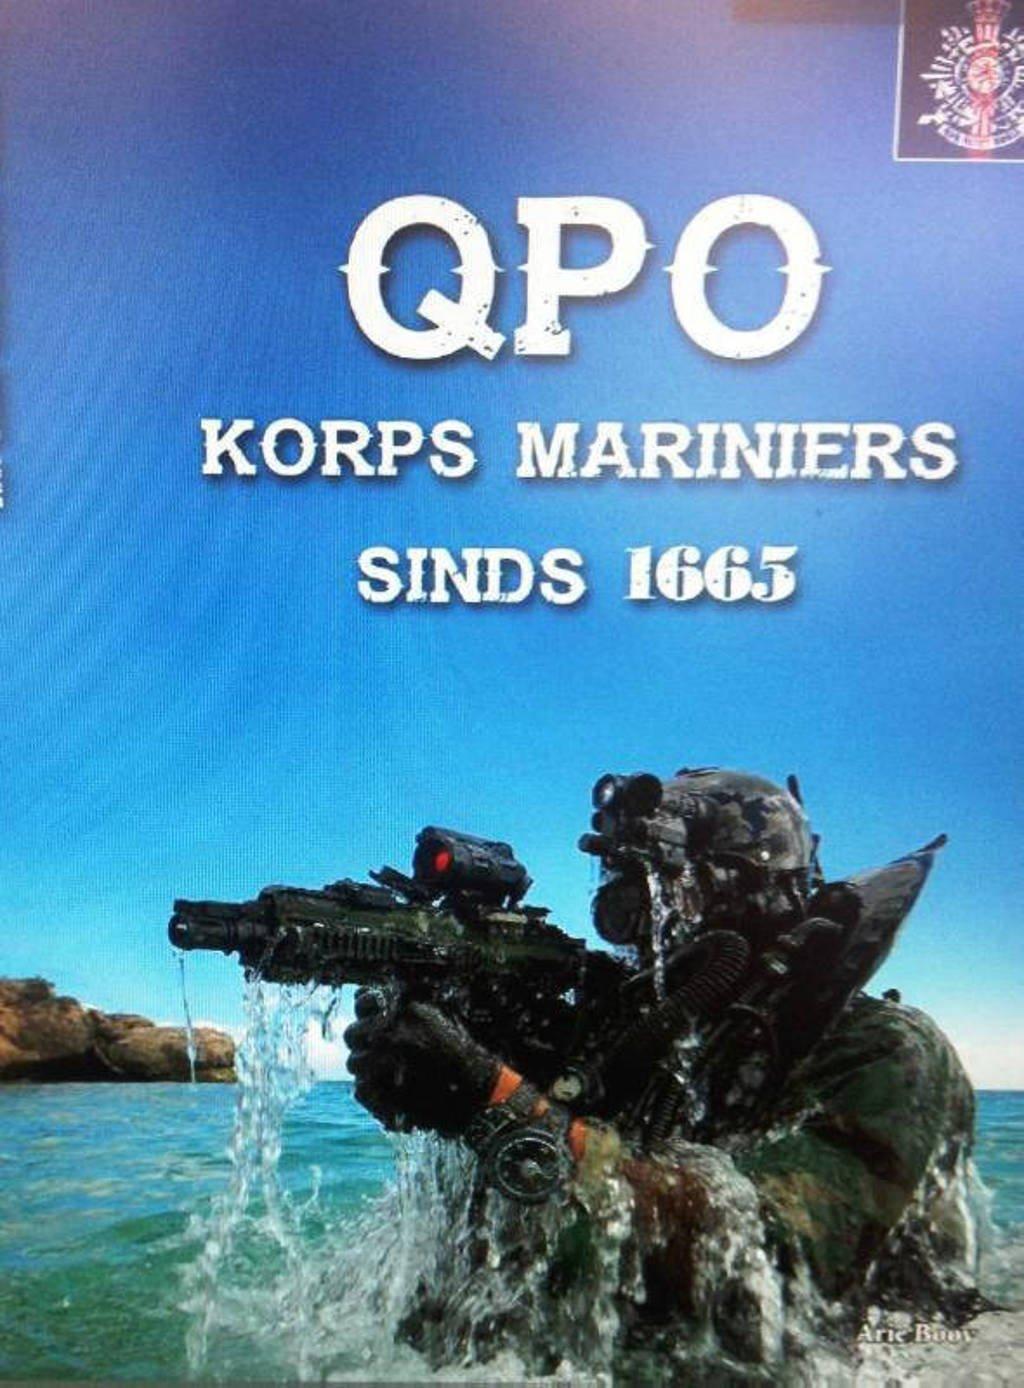 QPO, Korps Mariniers sinds 1665